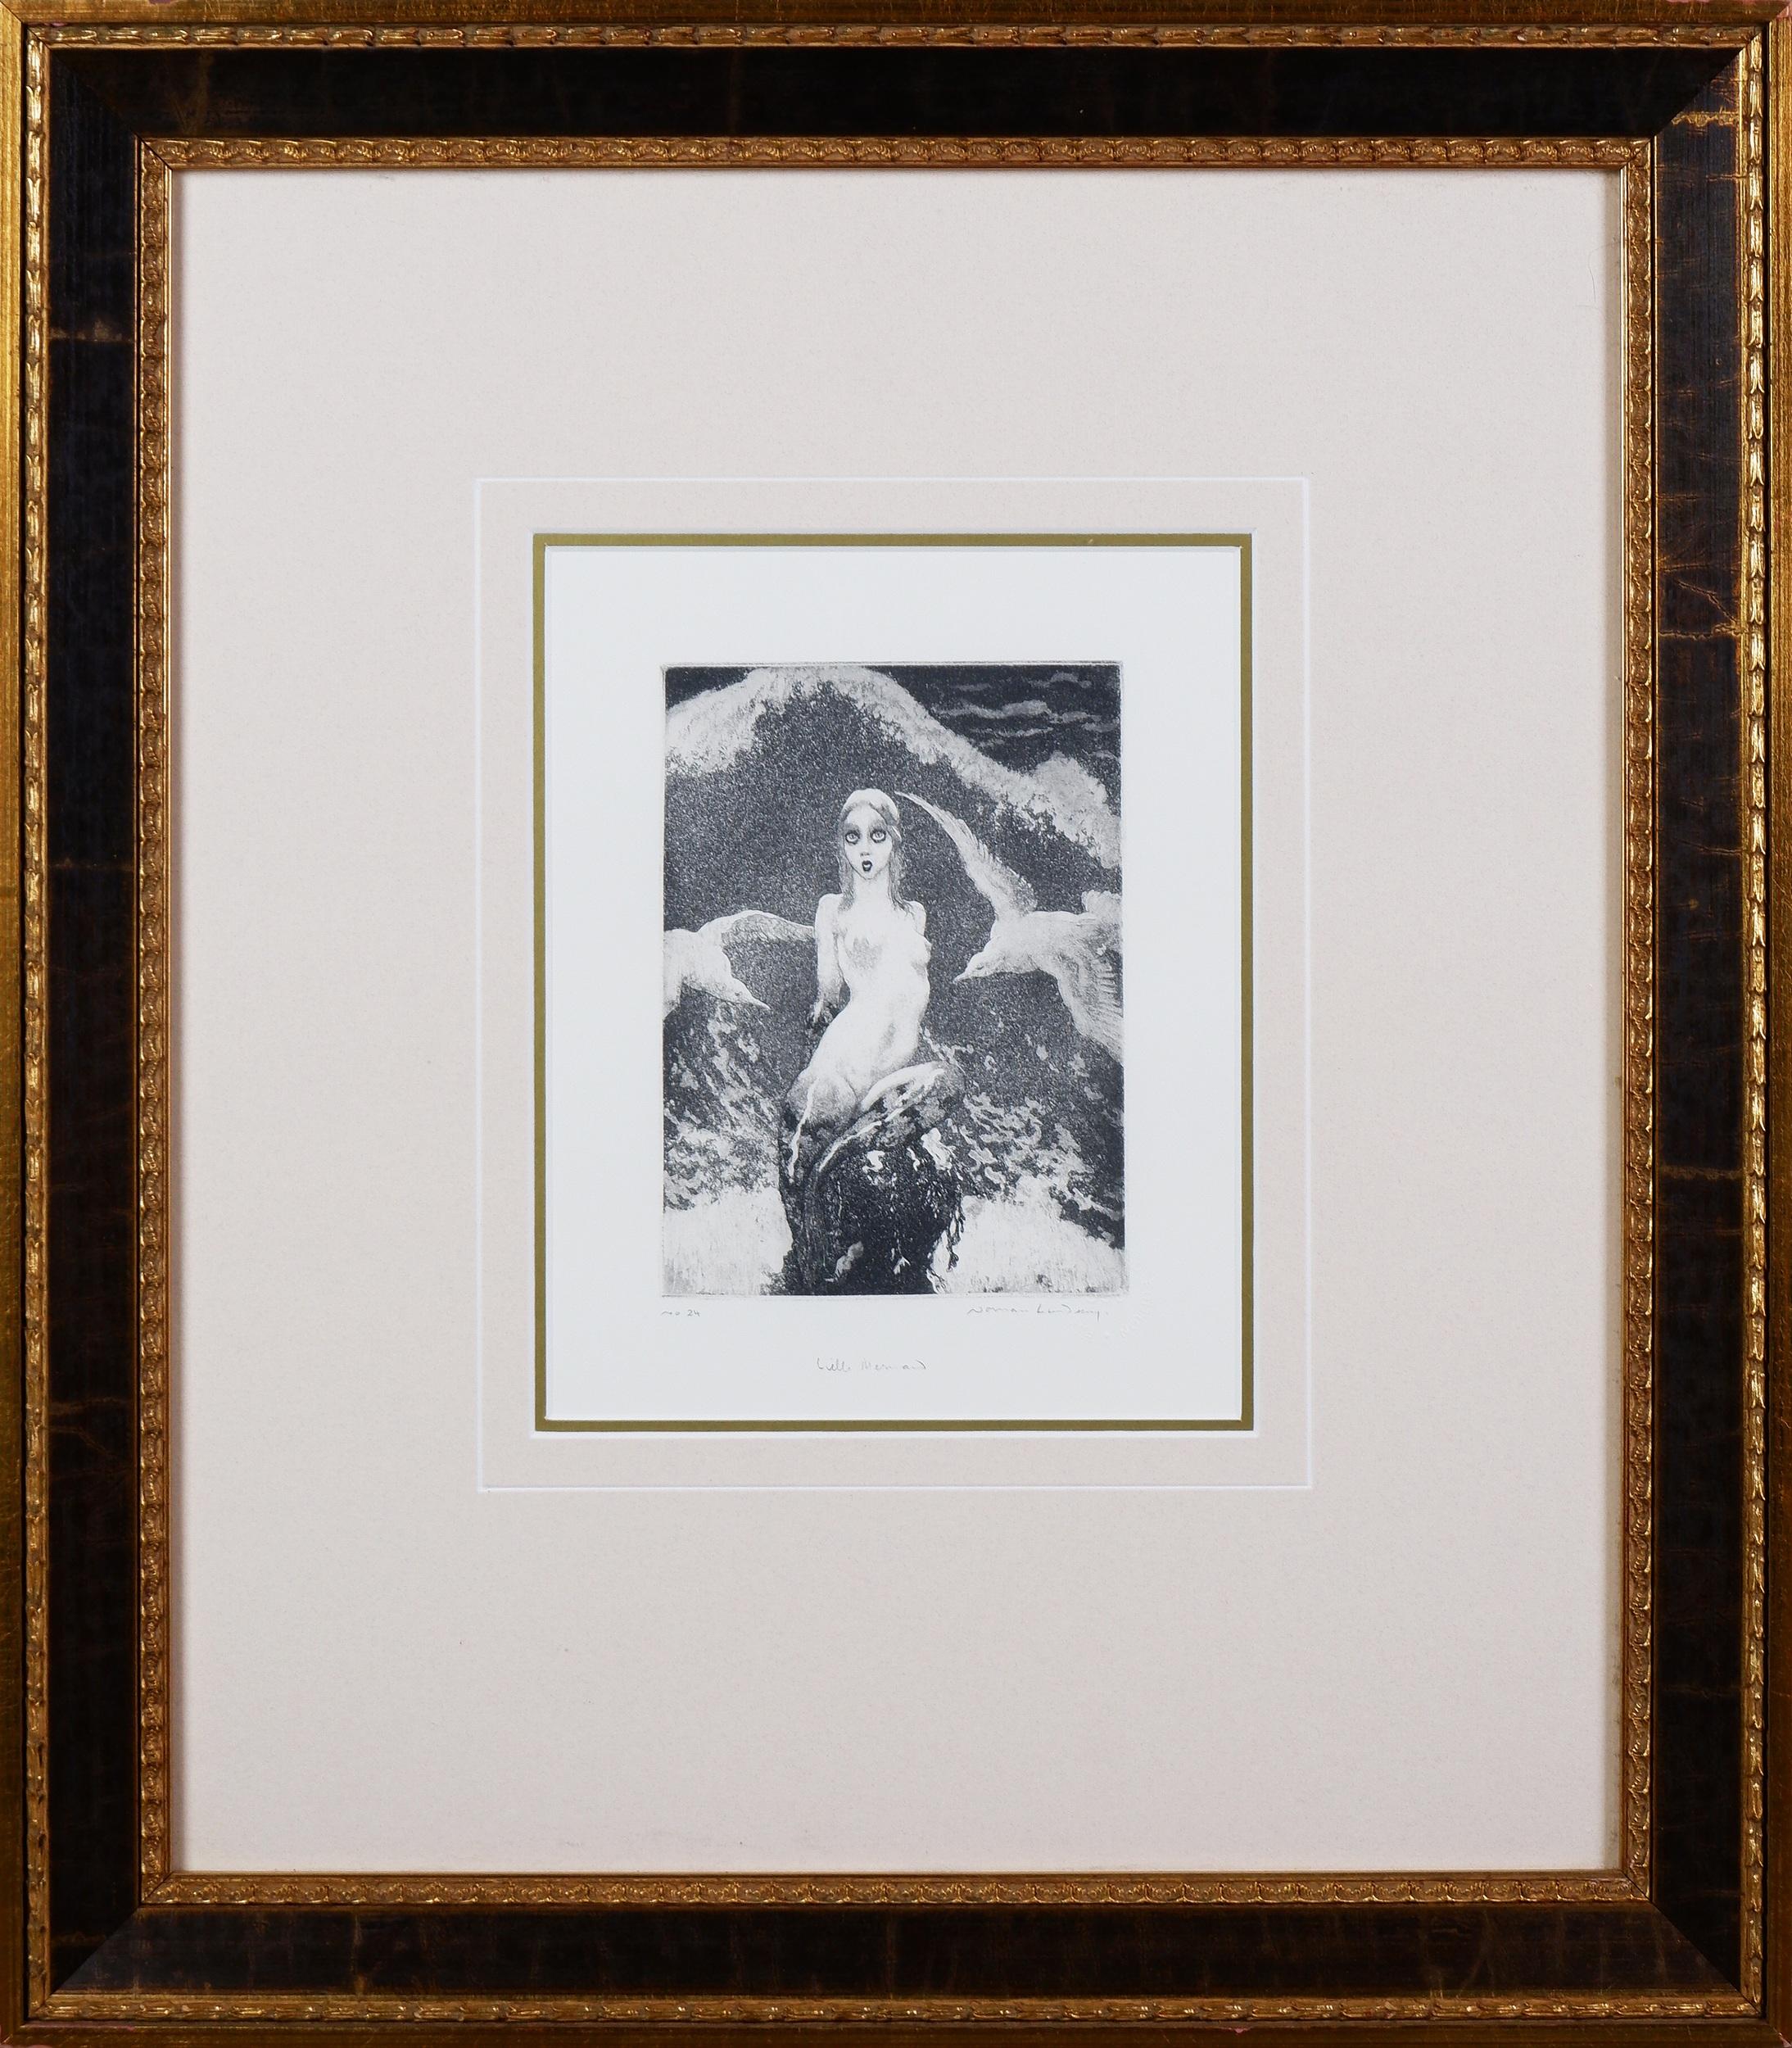 'Norman Lindsay (1879-1969), Little Mermaid, Facsimile Etching, 17.5 x 12.5 cm'